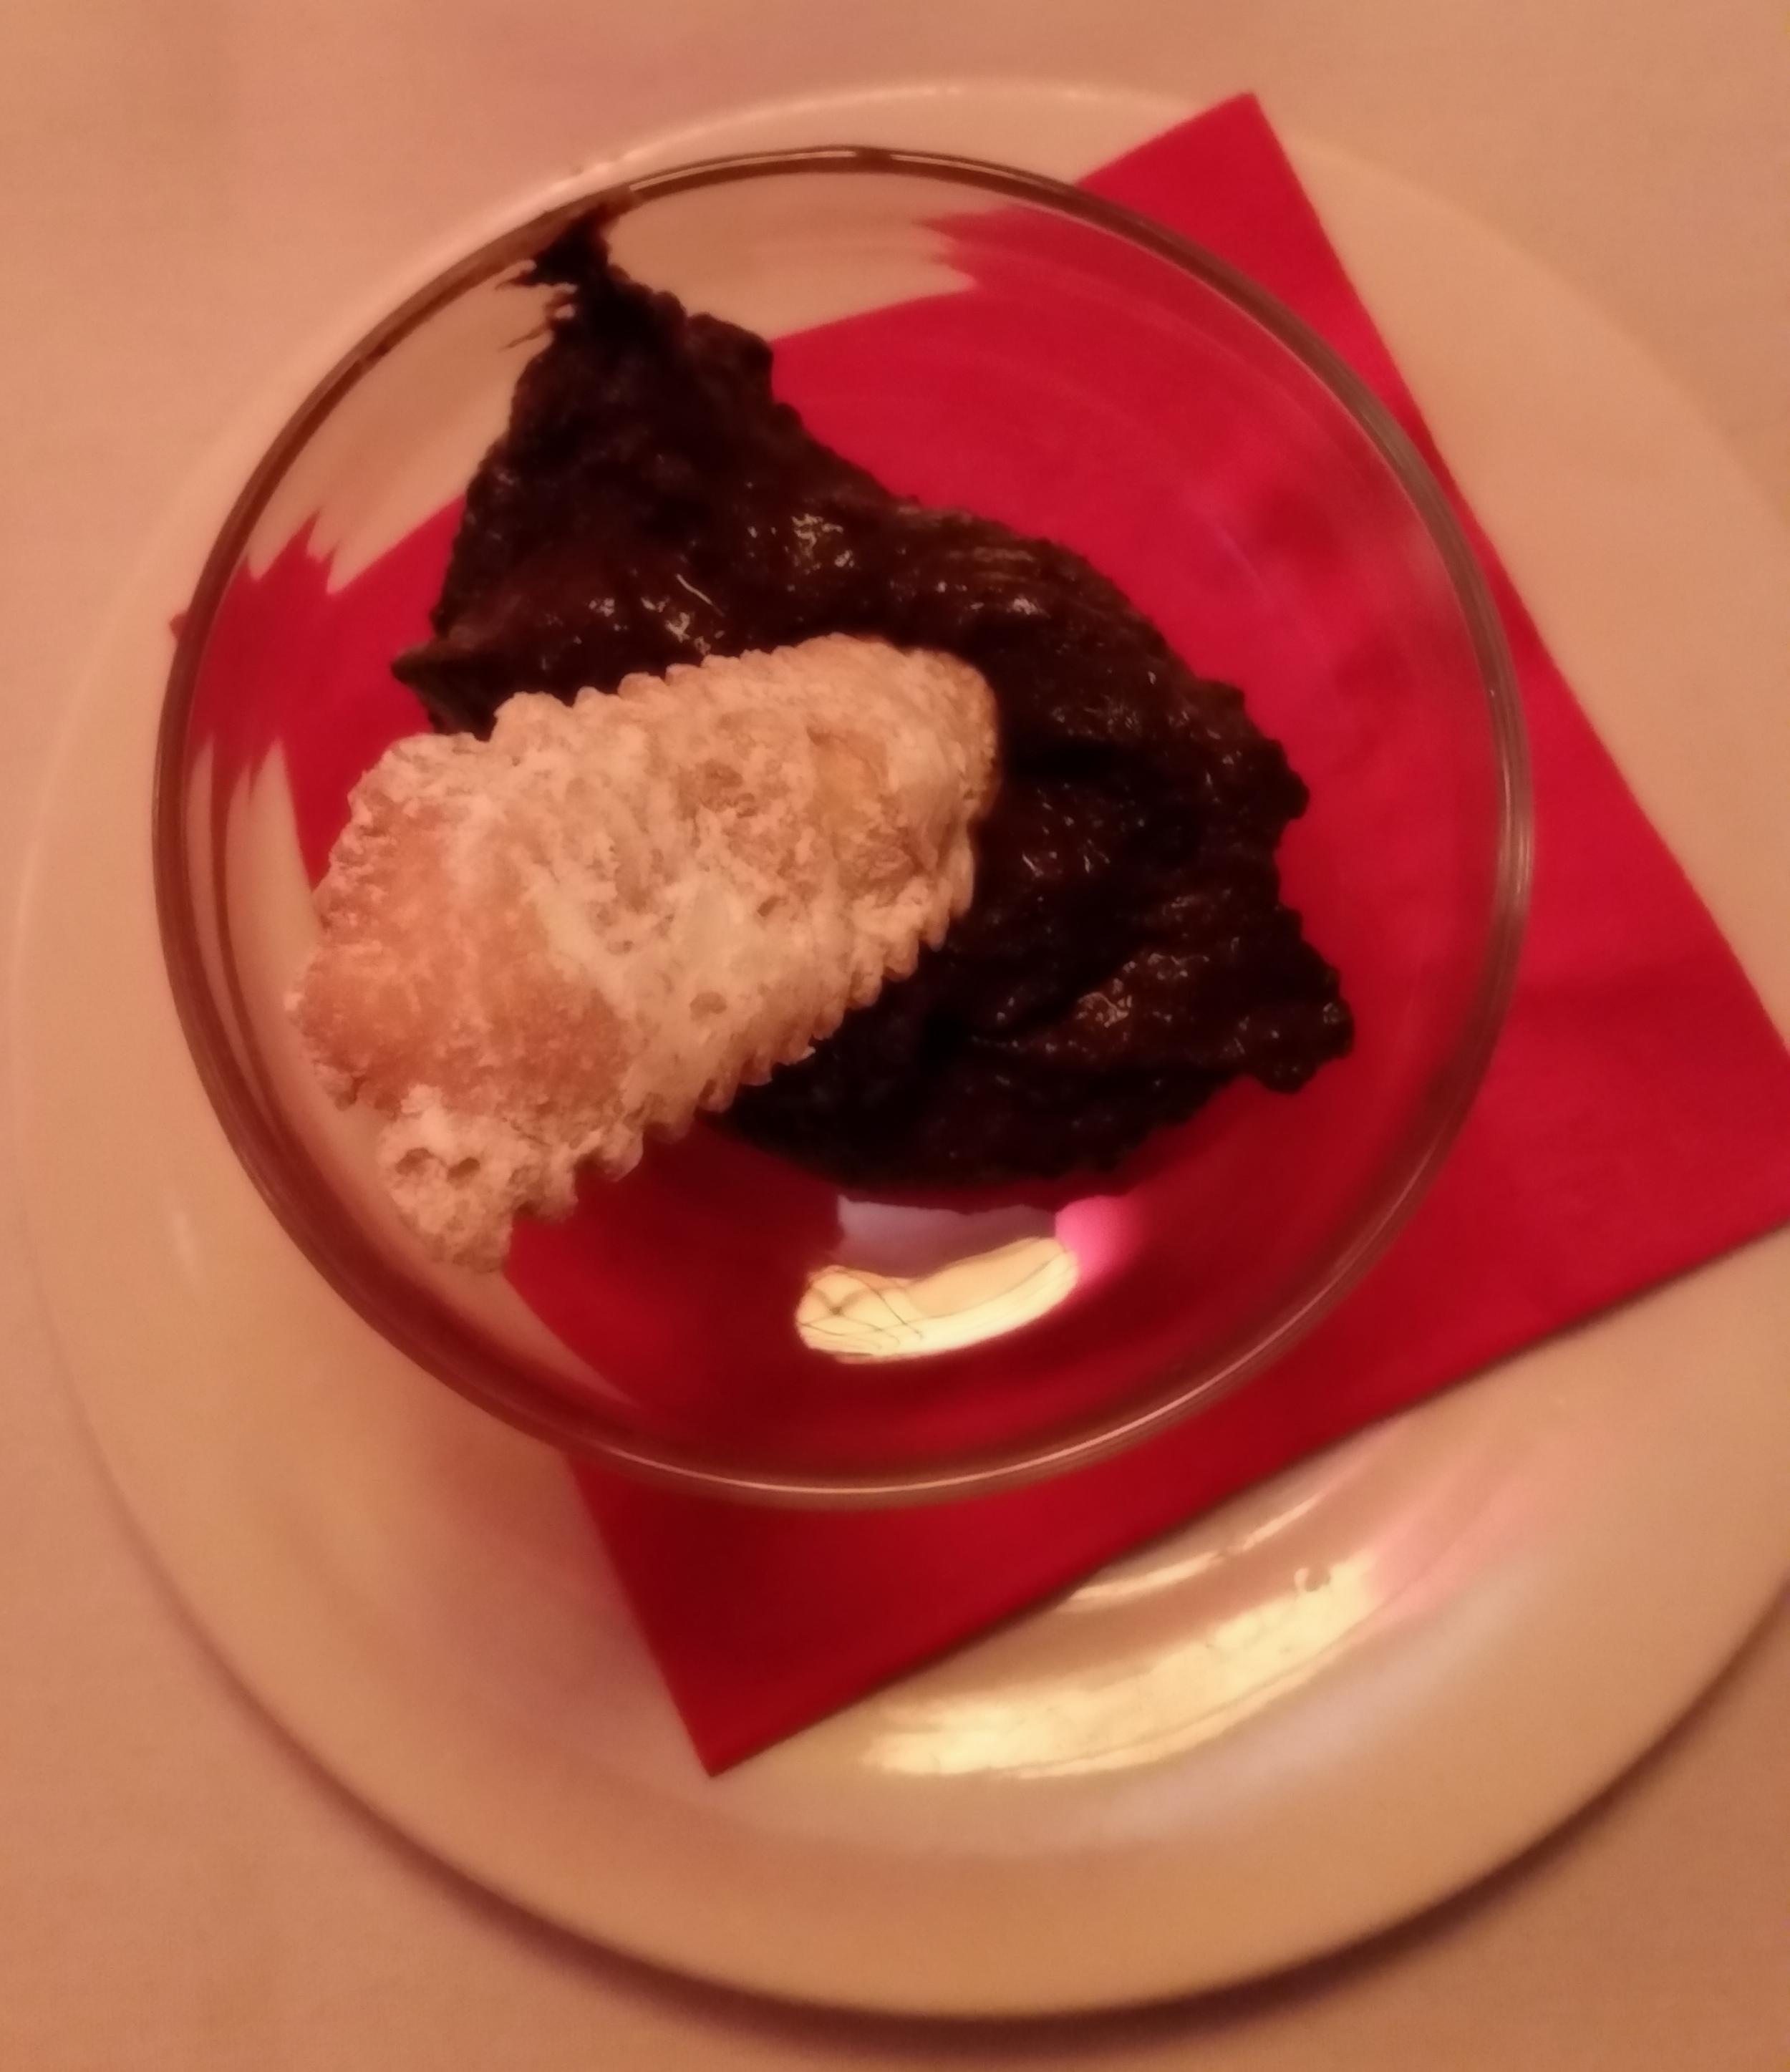 Sanguinaccio: Chocolate Pudding with Pig's Blood